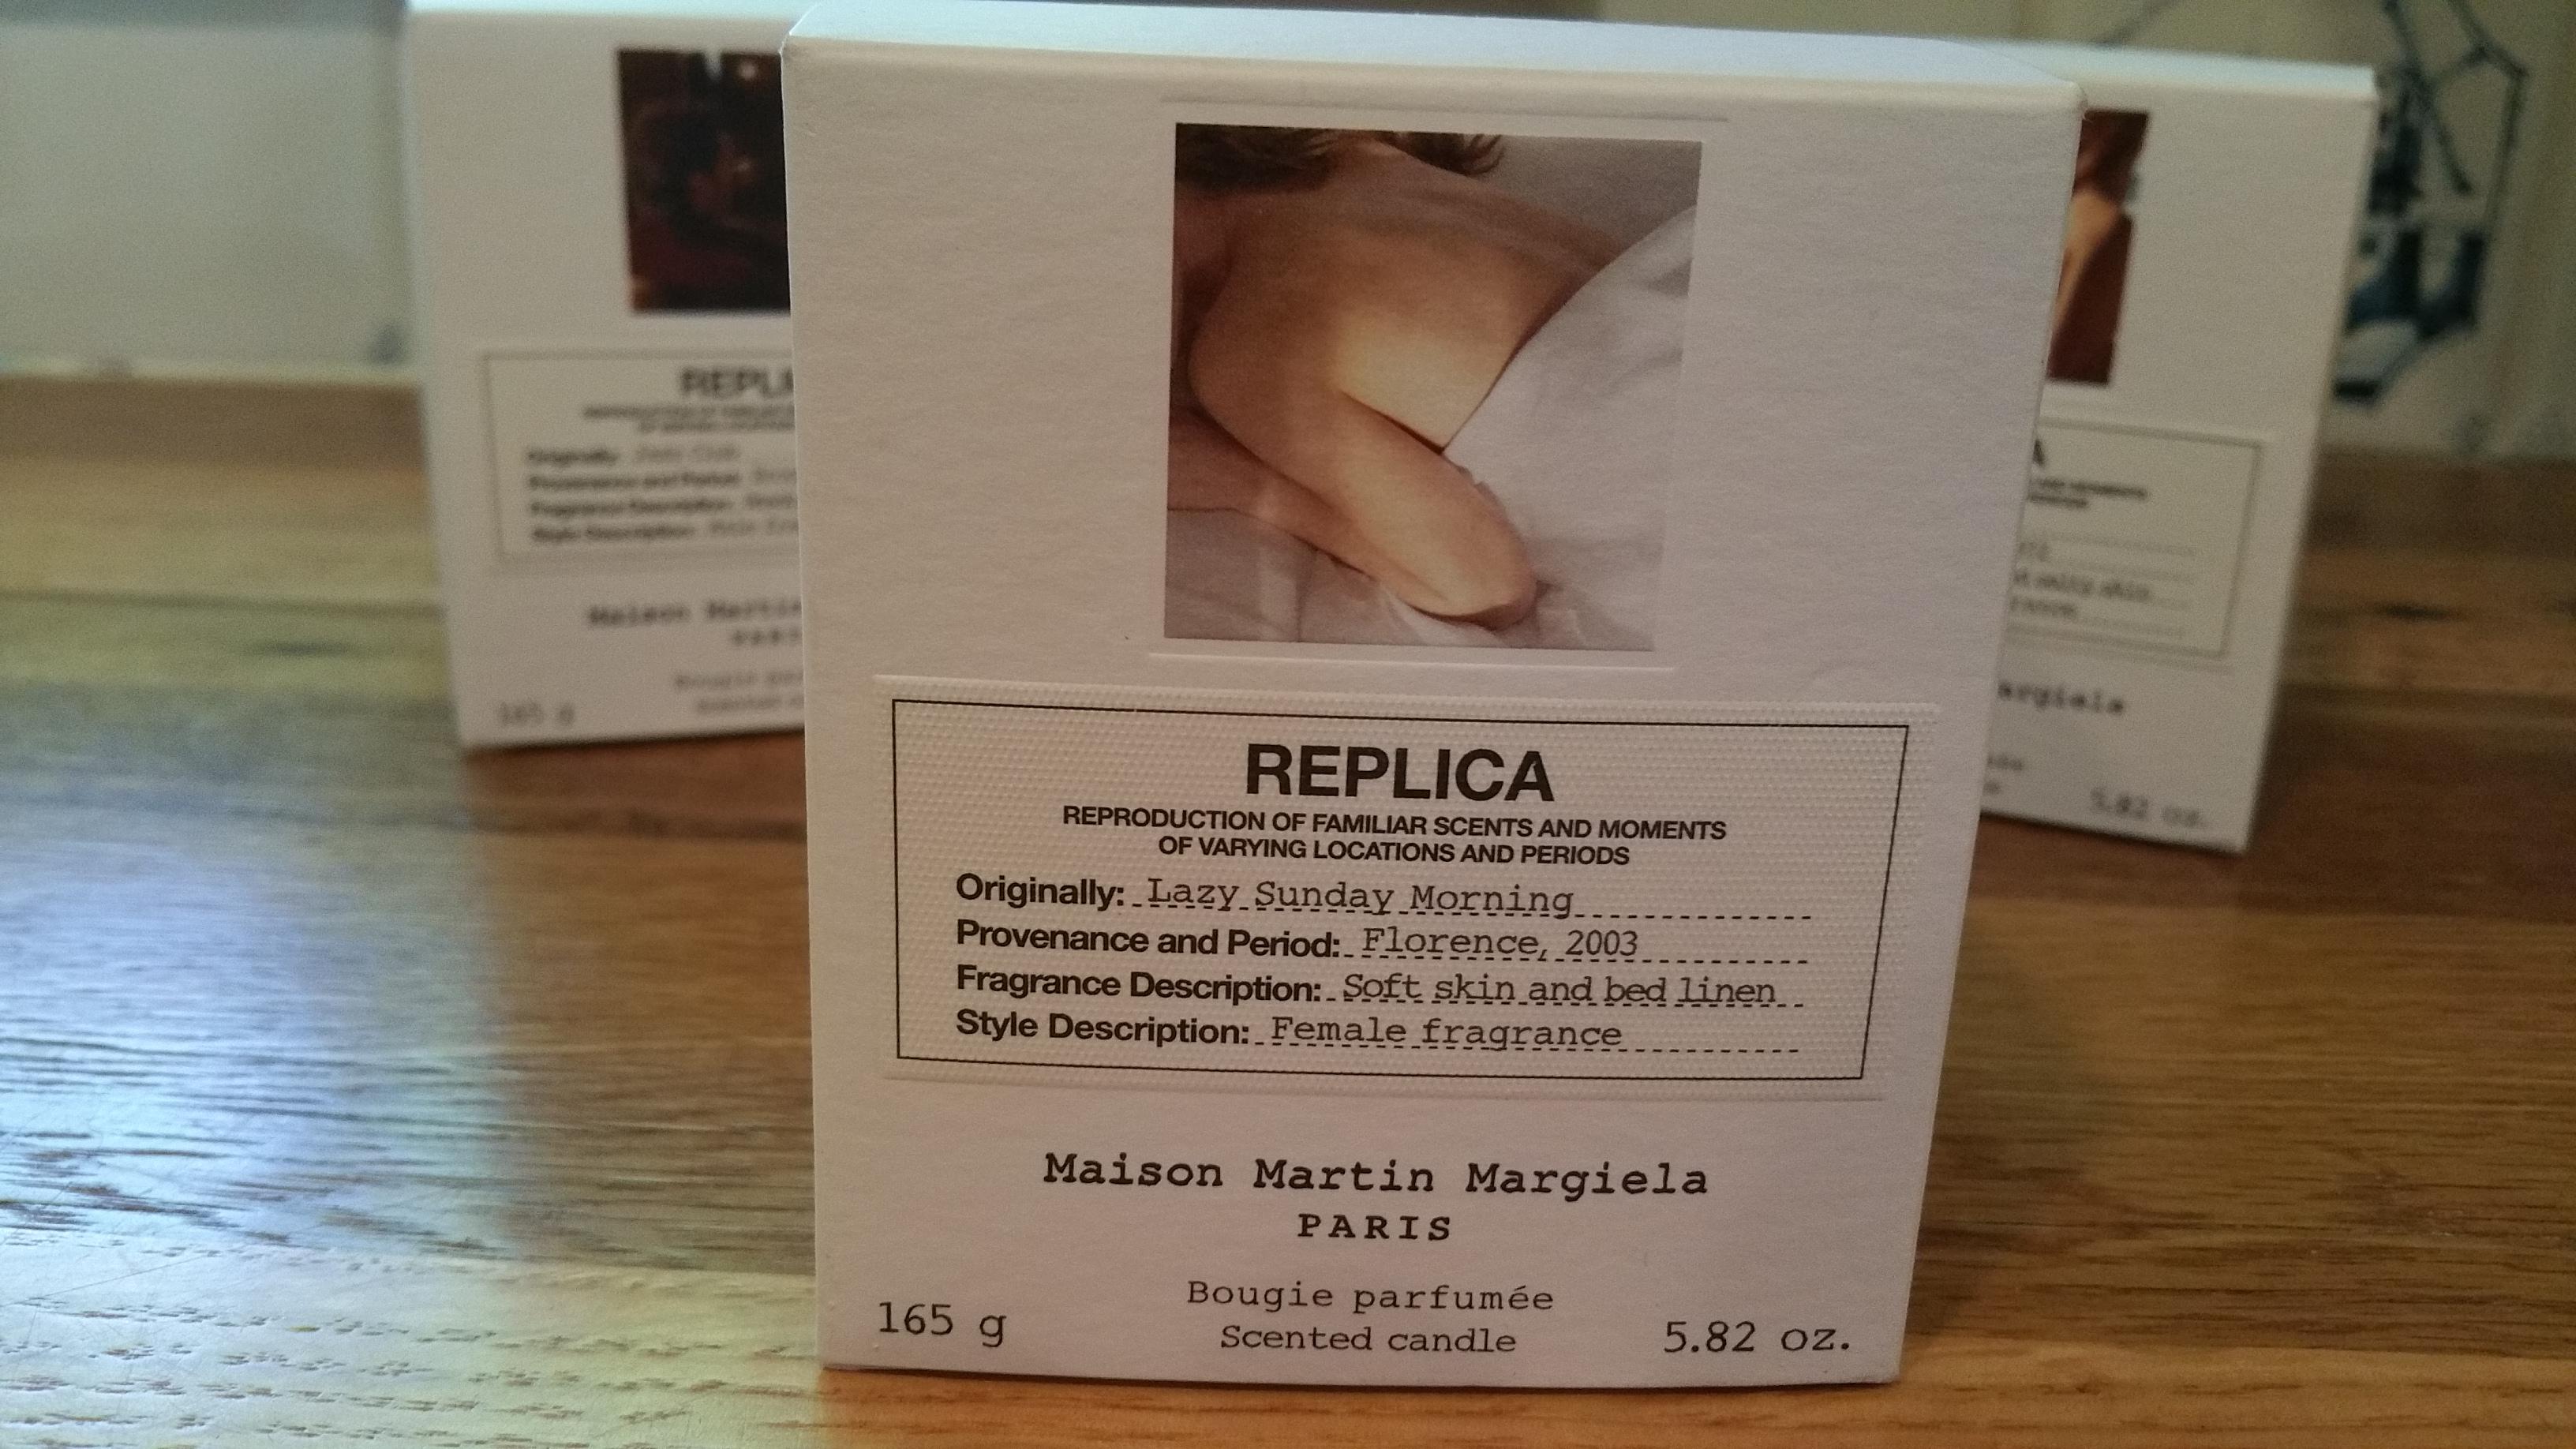 Replica by Maison Martin Margiela candles